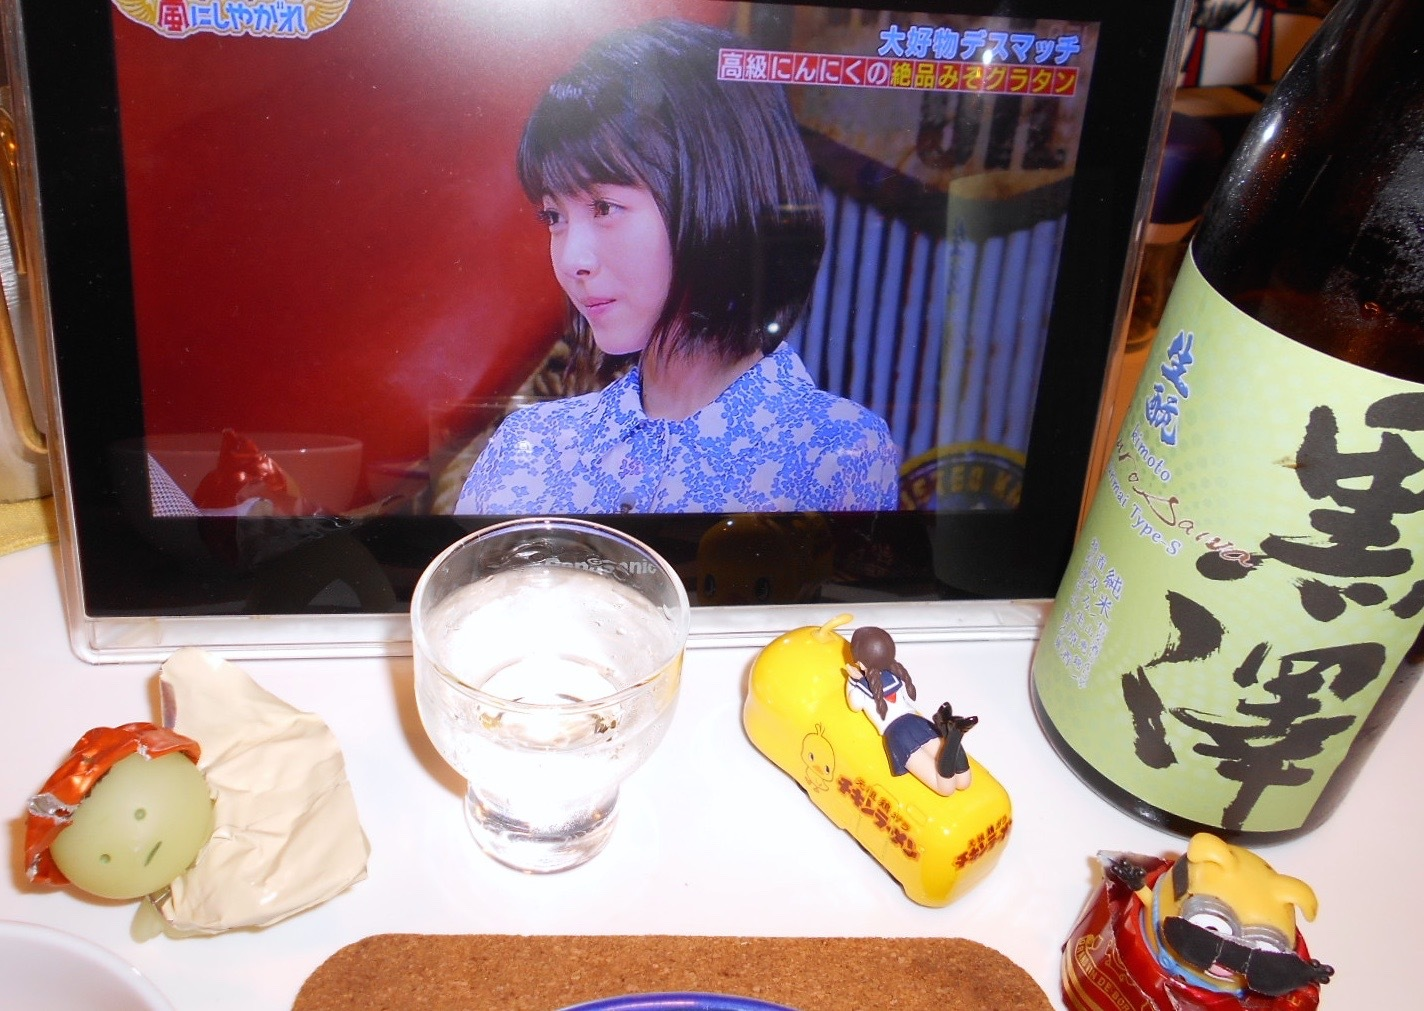 kurosawa_type-s30by2_5.jpg